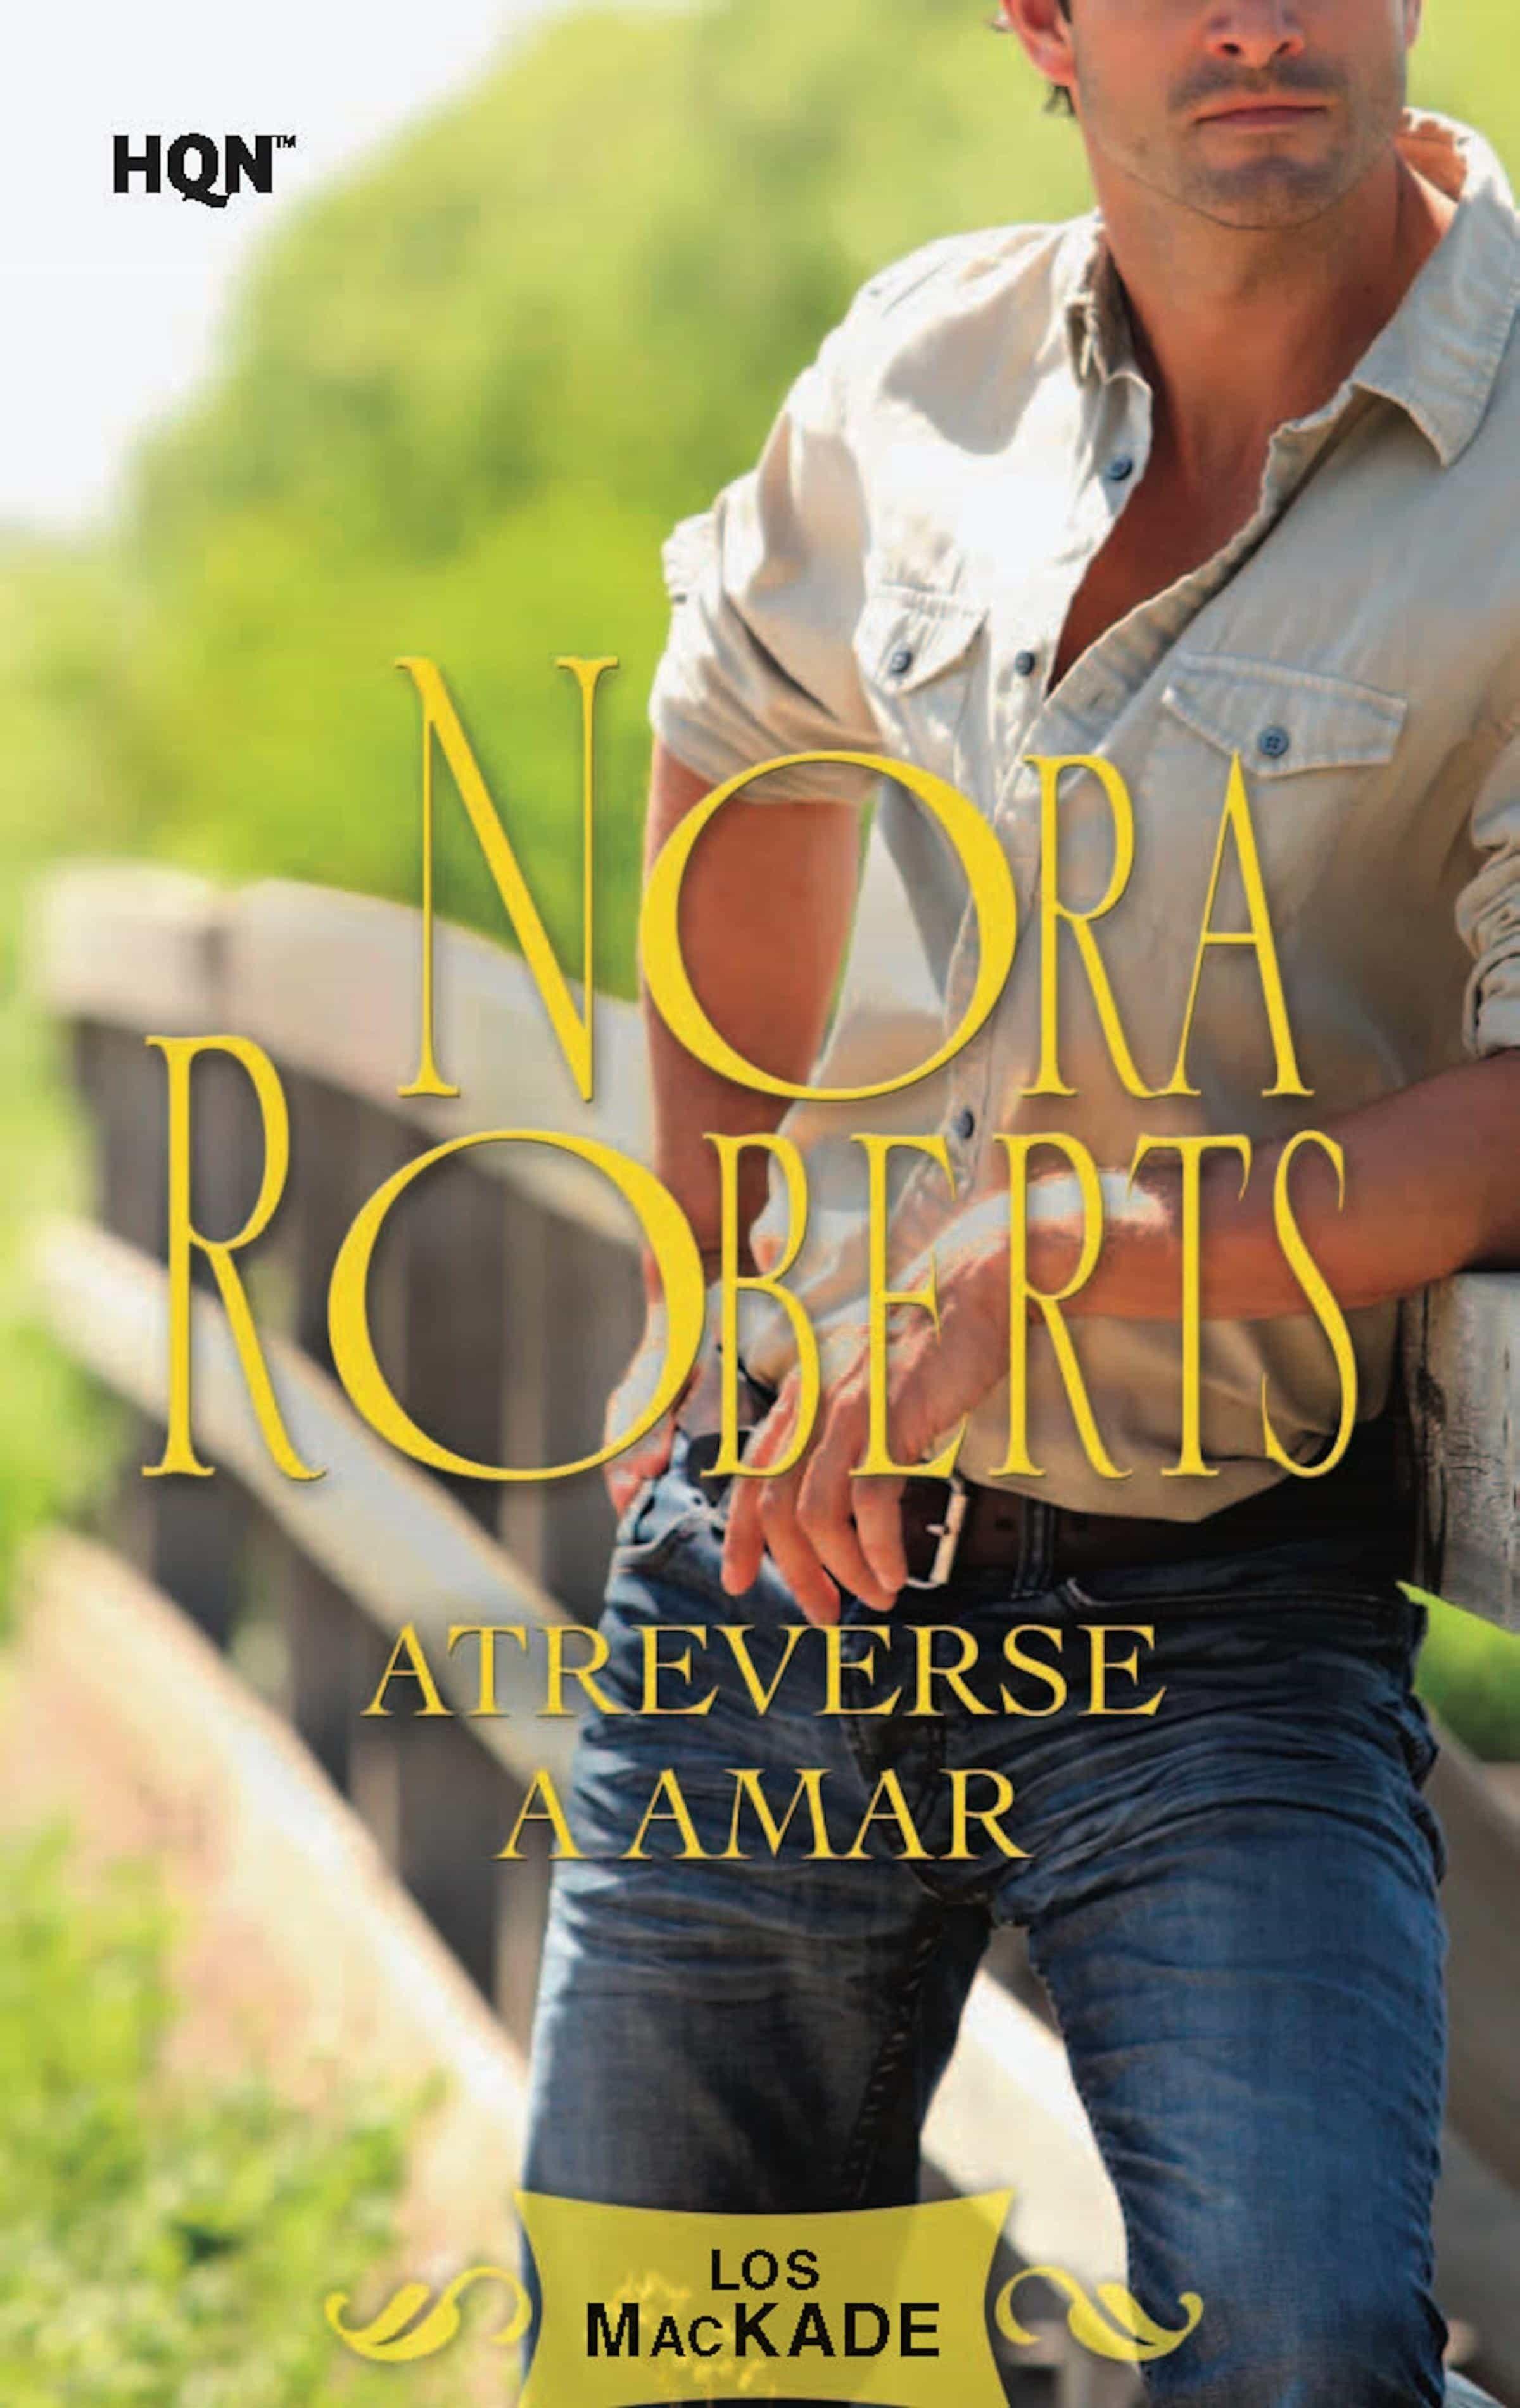 Atreverse A Amar   por Nora Roberts